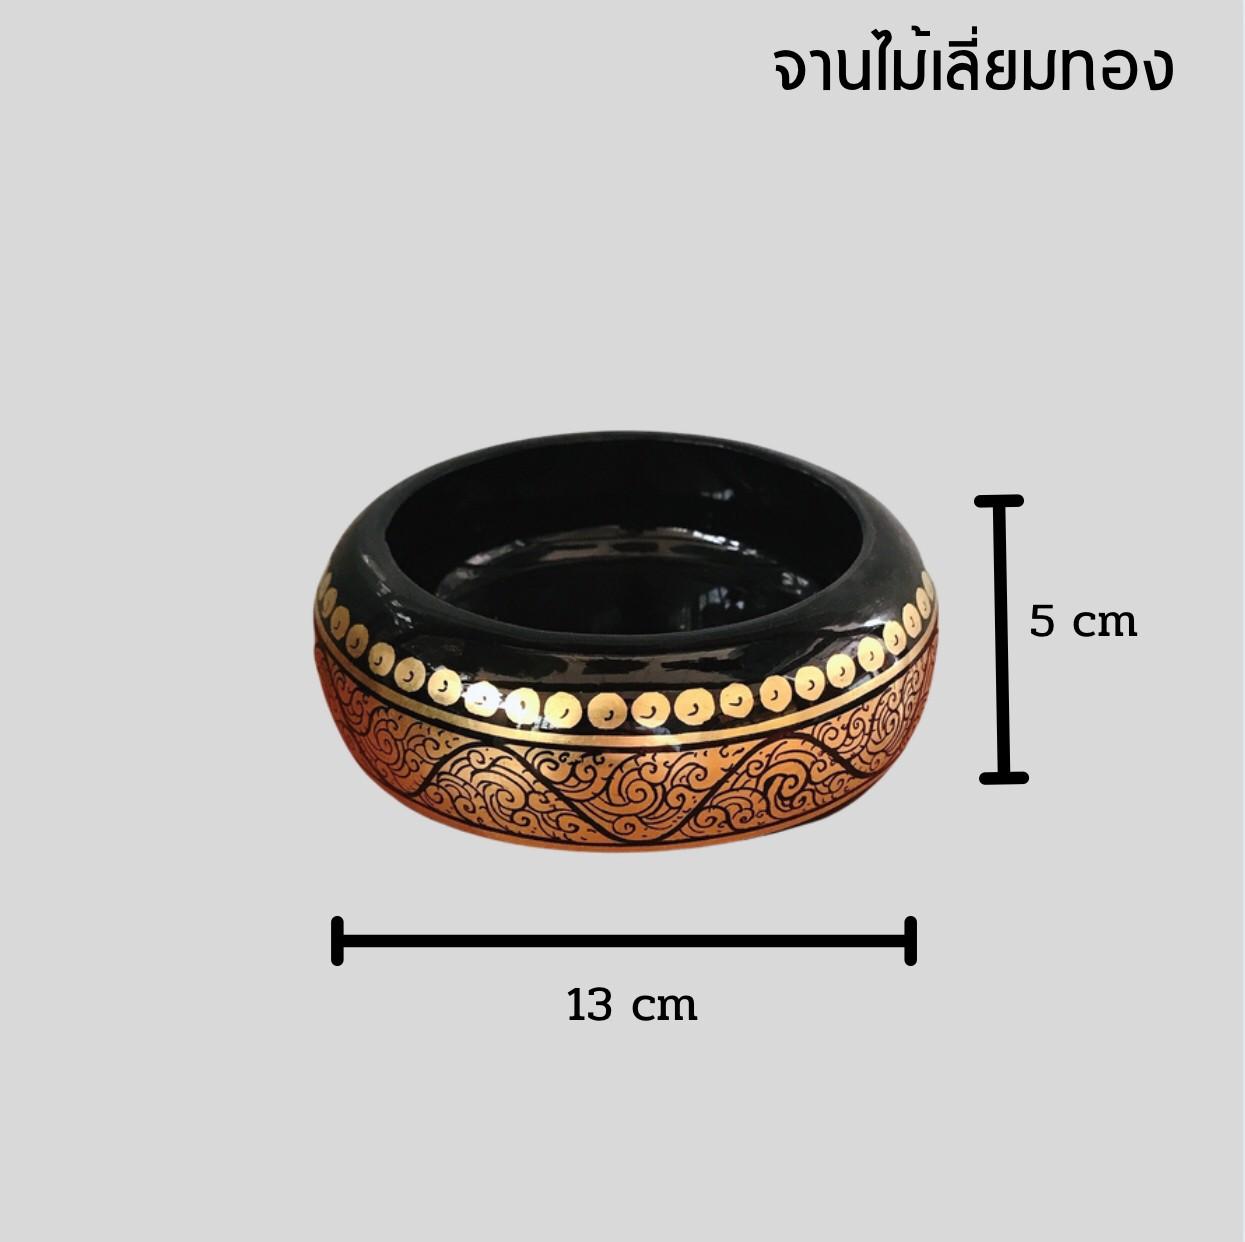 Gold Trinket Bowl(จานไม้ลงลักปิดทอง)